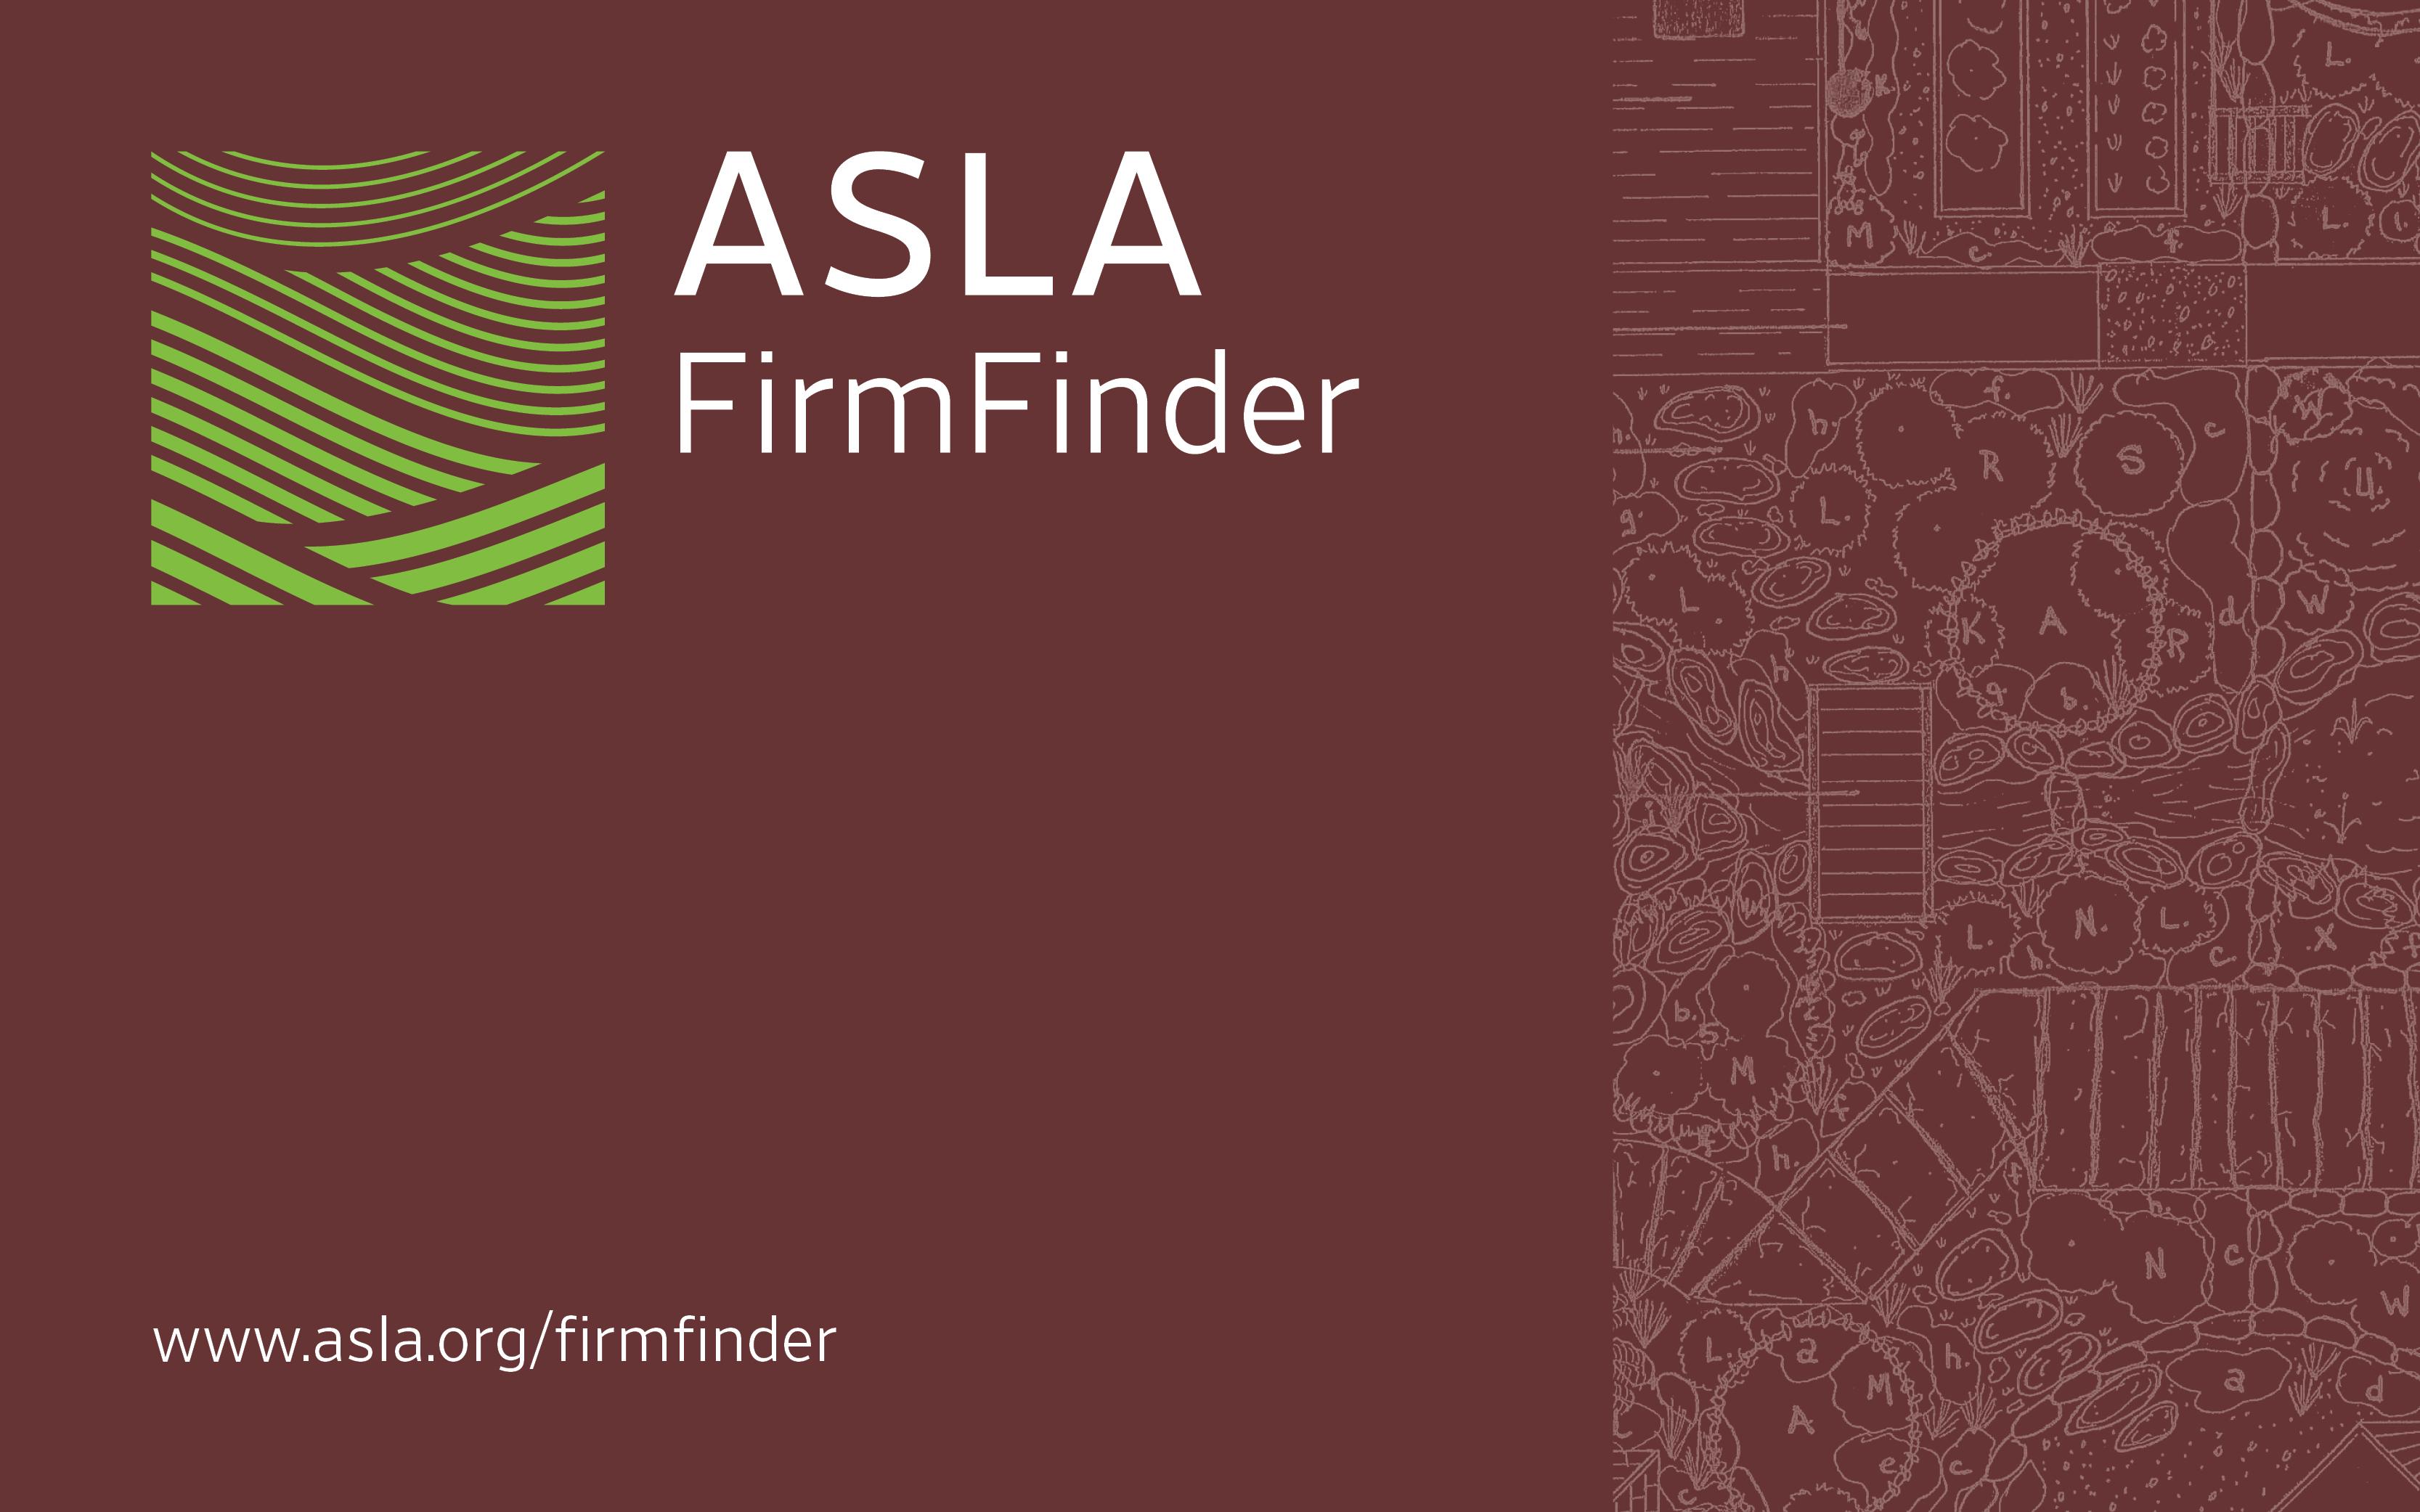 Firmfinder My Asla Org